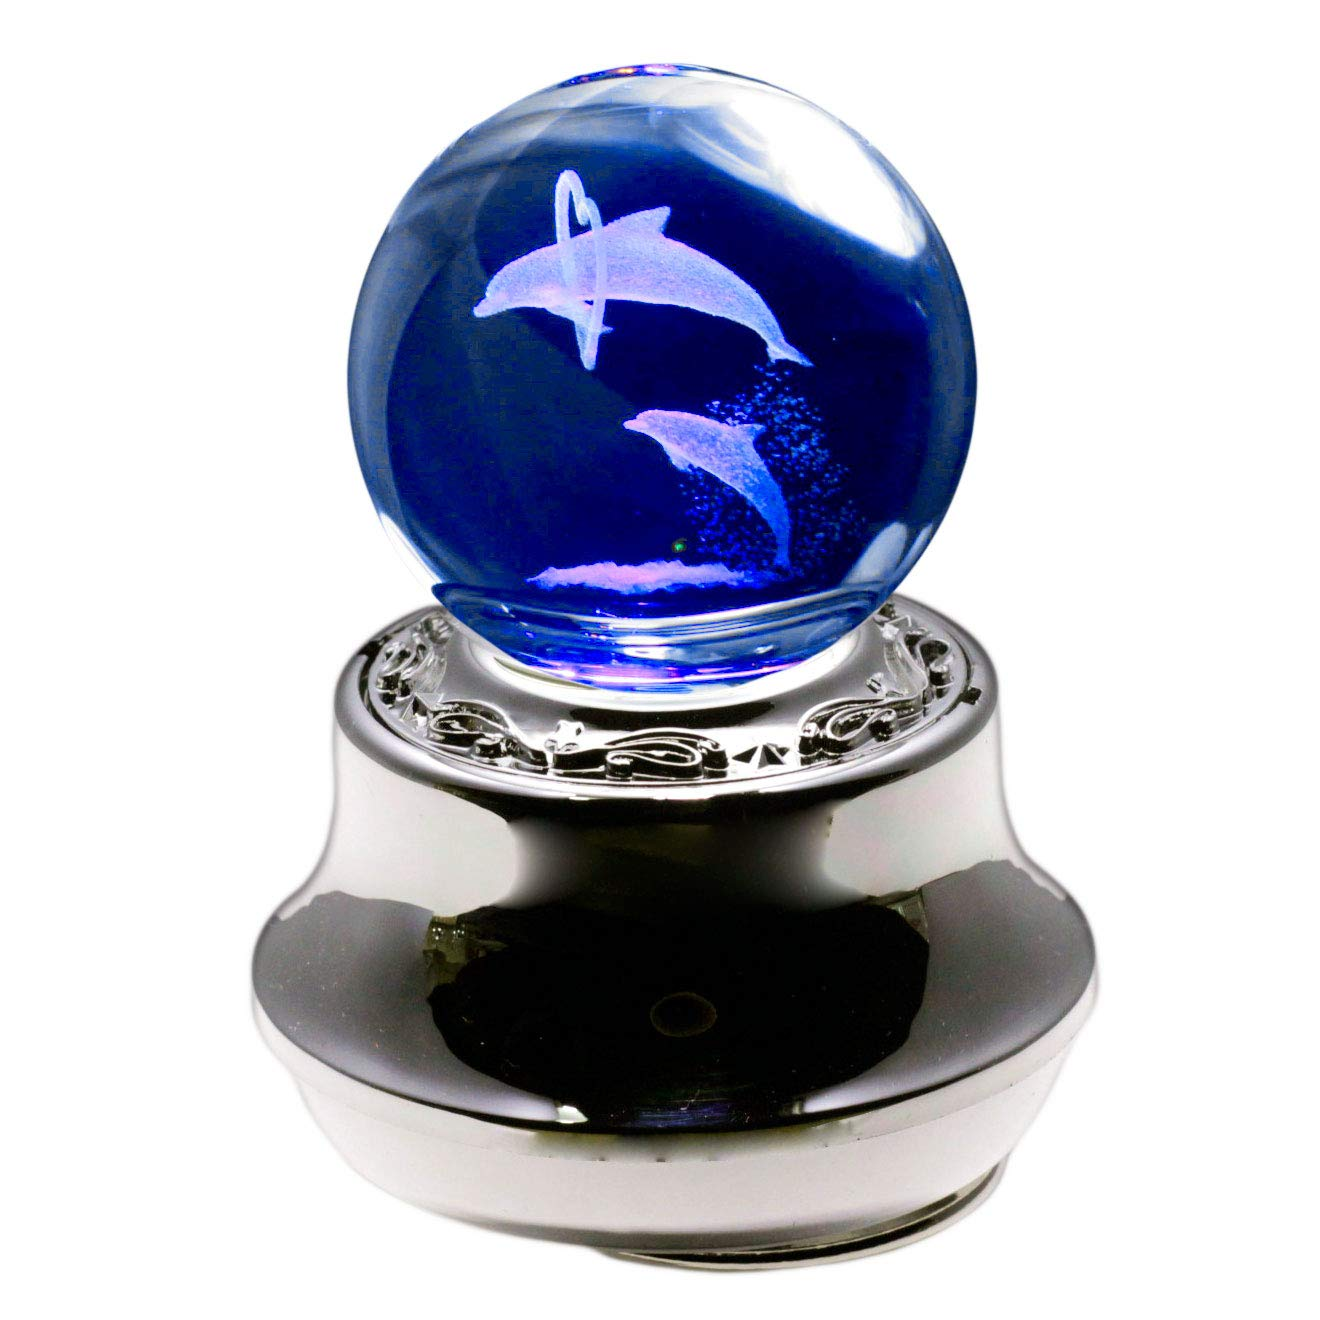 3Dレーザークリスタル 光るオルゴール ペアイルカ 曲目:星に願いを 誕生日プレゼント 女性 人気 プレゼント ギフト 母 女の子 サンキョー製 SANKYO LEDライト ゼンマイ式